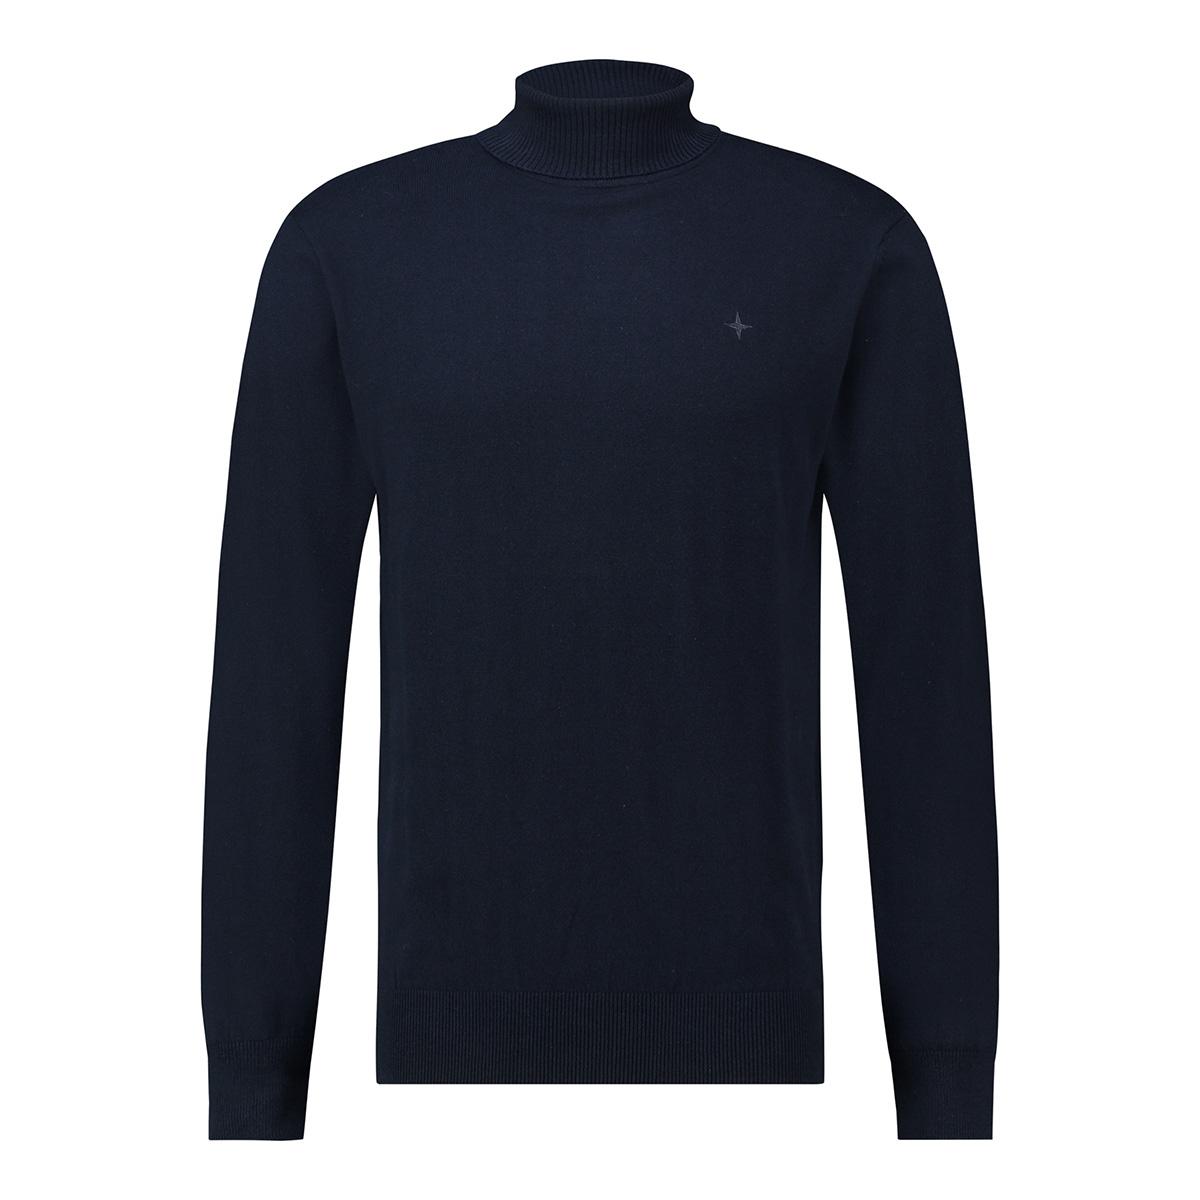 knit roll neck me 0201 haze & finn trui dark navy